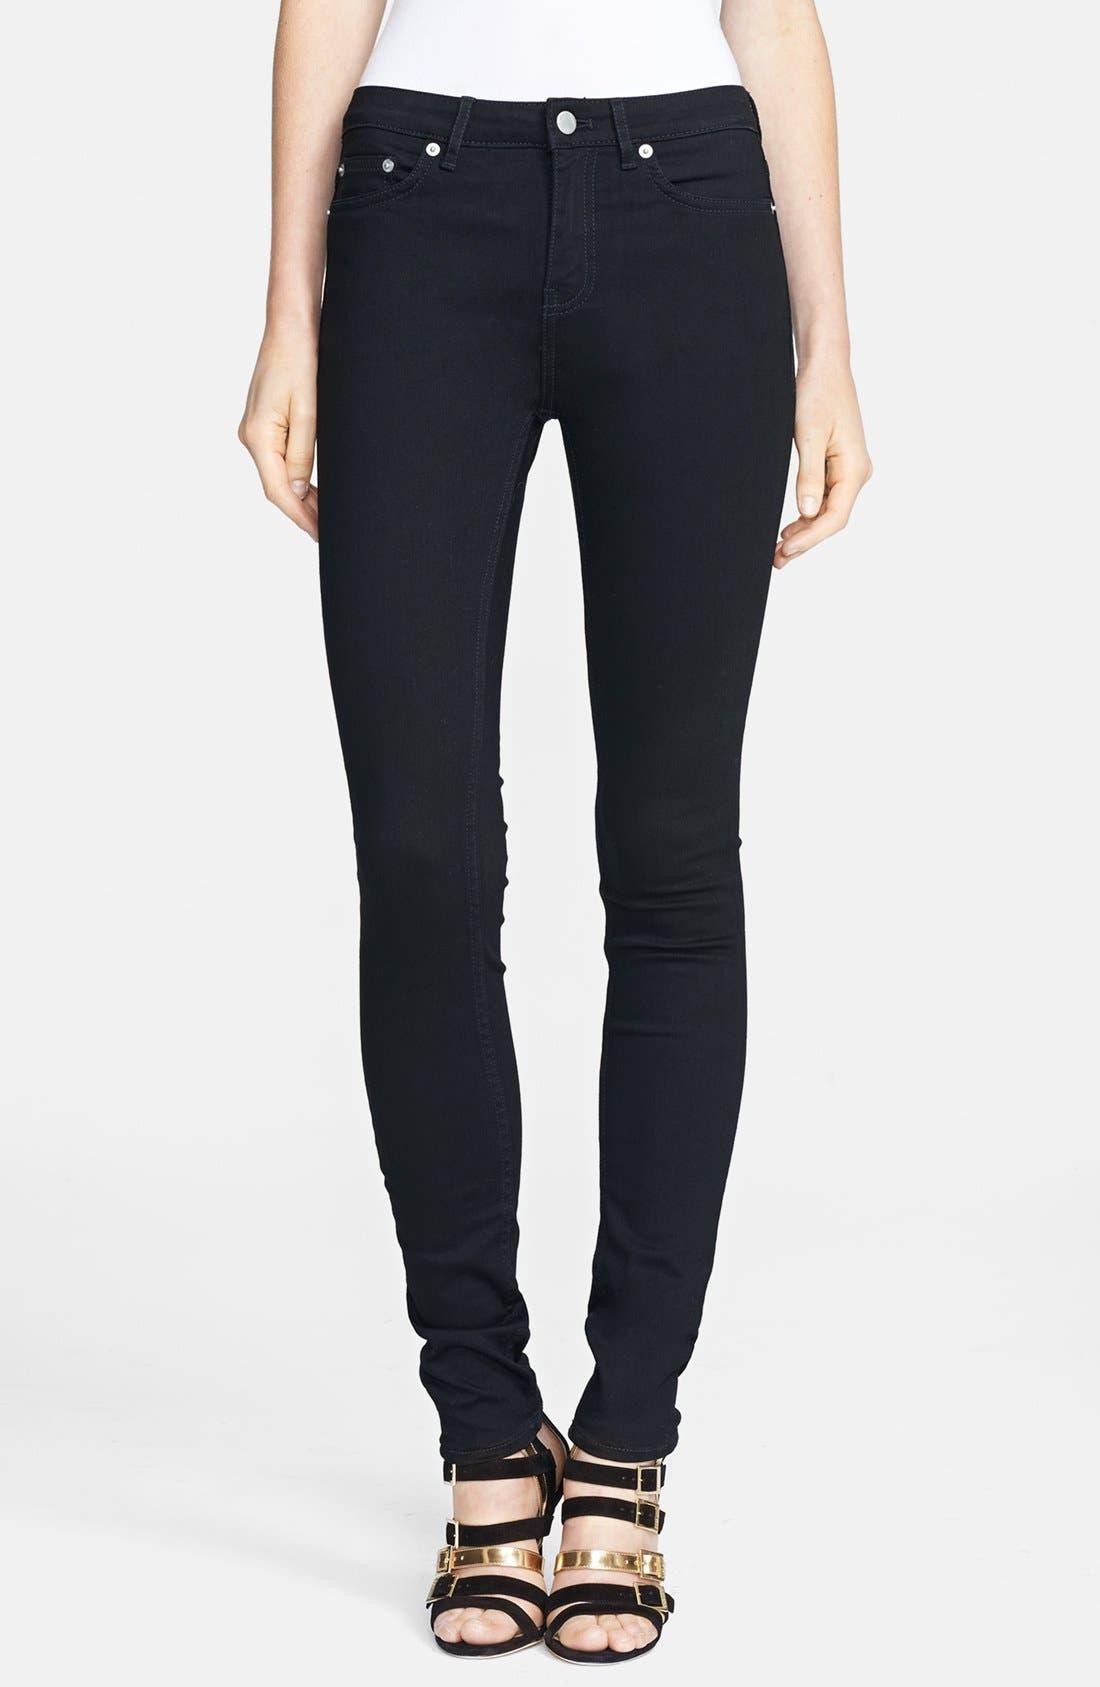 Alternate Image 1 Selected - BLK DNM Skinny Jeans (Monroe Black)